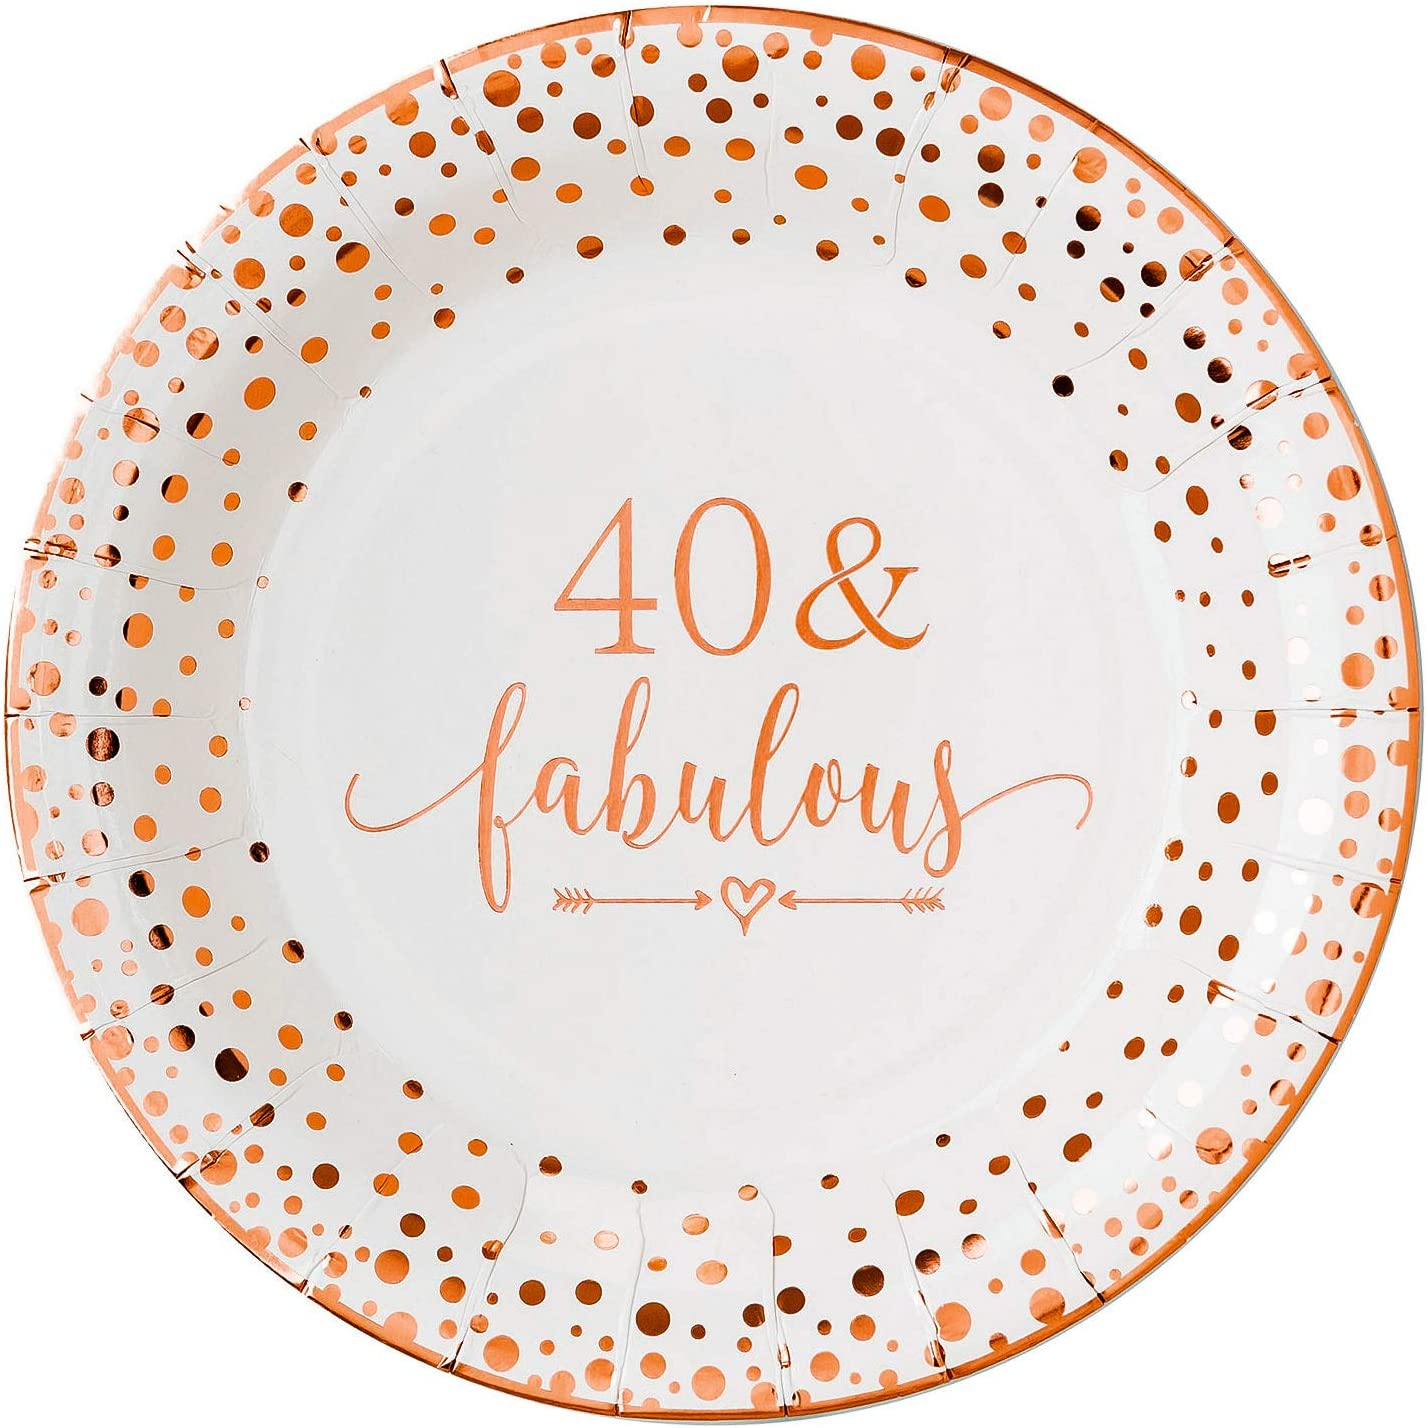 Crisky 40 Fabulous Disposable Plates Dec Brand new for Women Gorgeous Birthday 40th